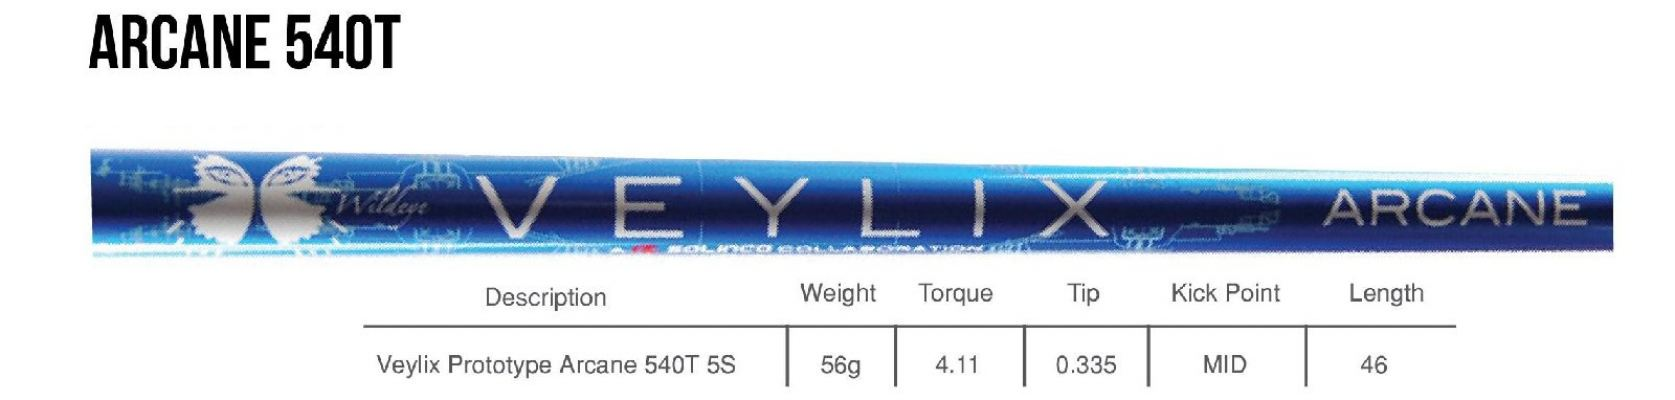 Veylix ARCANE 540T Driver Shaft